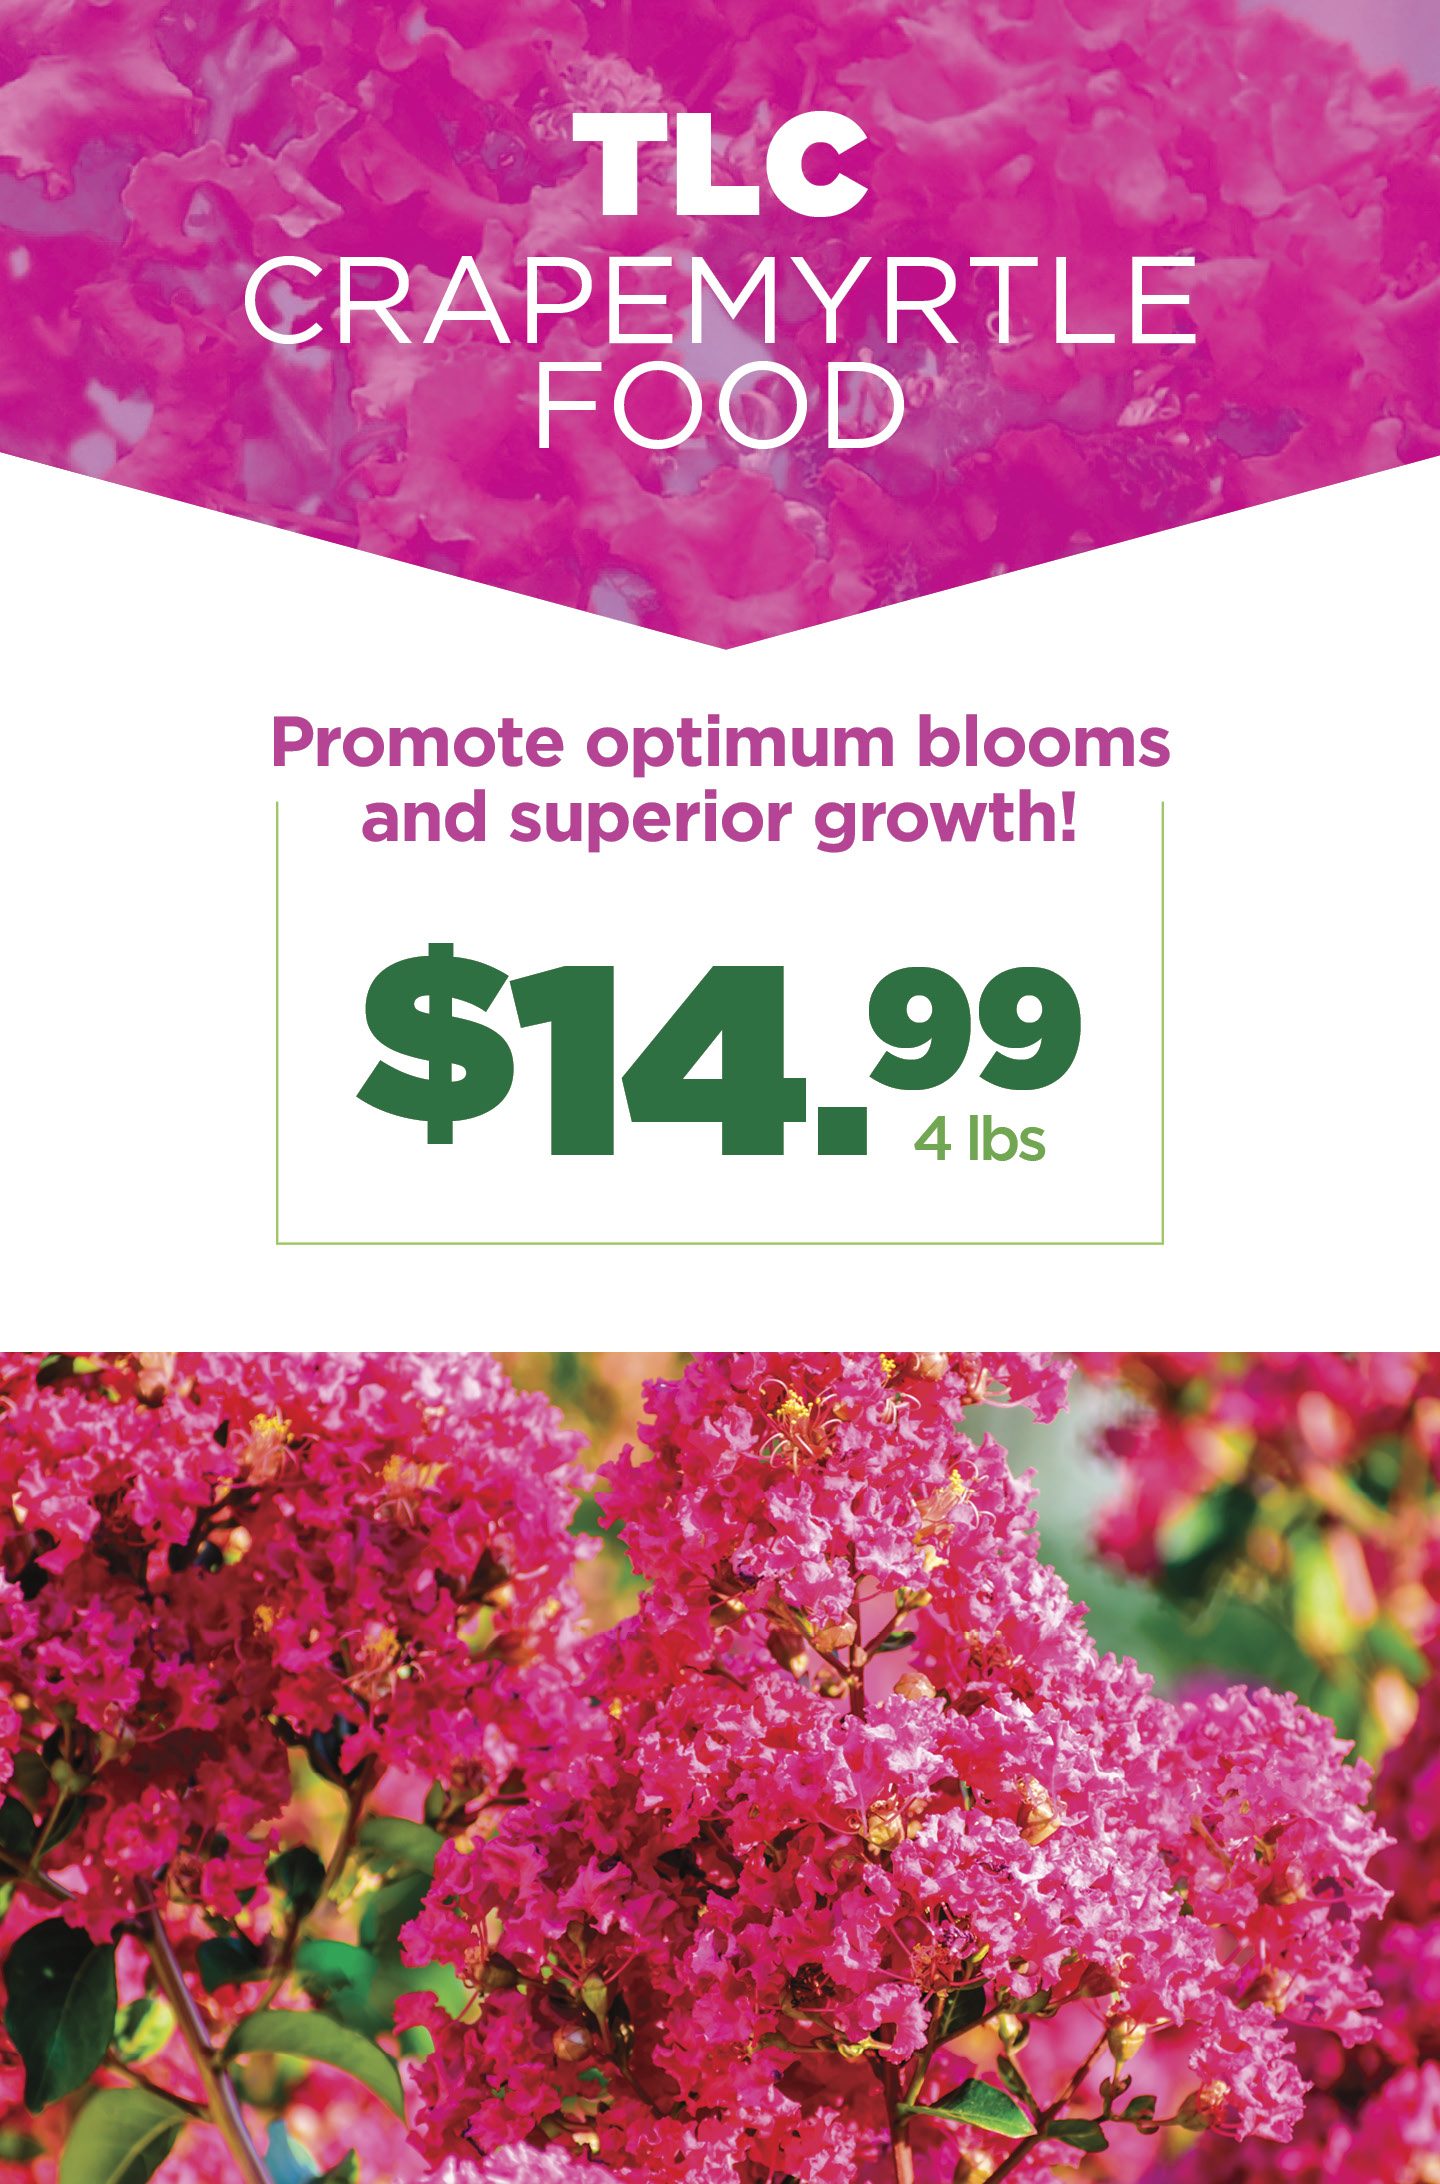 Crapemyrtle Food | TLC Garden Centers